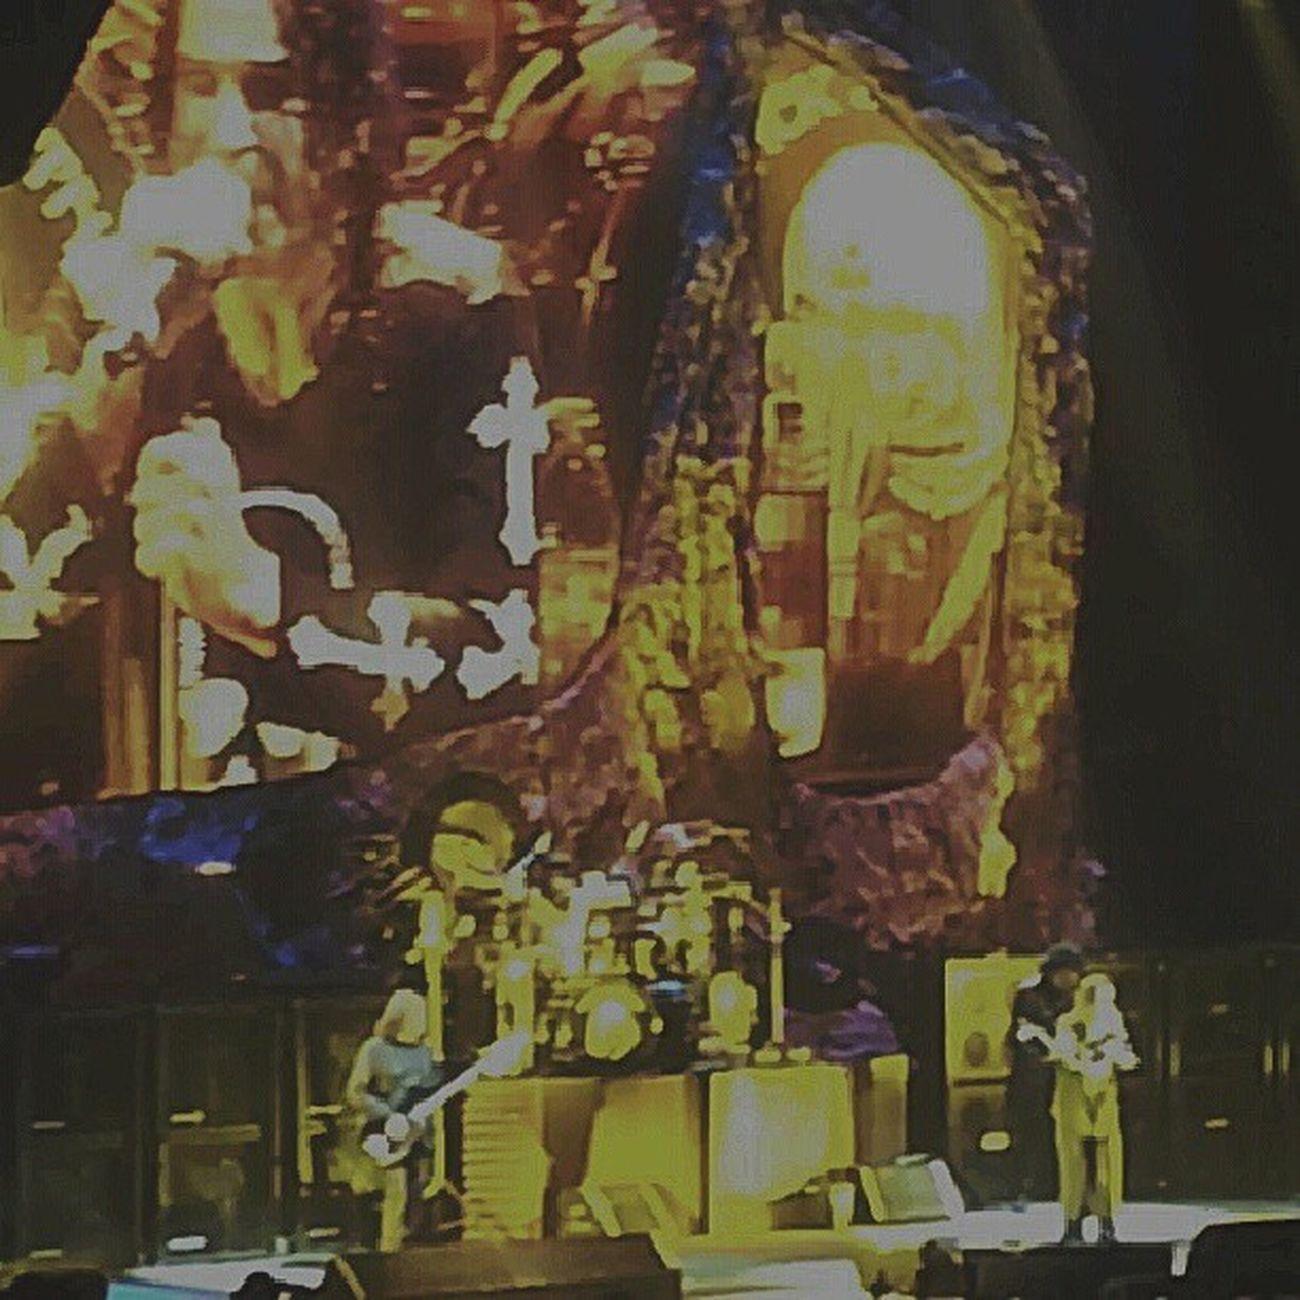 Blacksabbath Ozzy Metal Heavymetal paranoid warpigs music vinyl guitar 13 metal ironman osbourne ozzyosbourne geezer tommyiommi sabbath live in brisabane 2013 australia love like4like band followforfollow rock awesome stage bass likeforlike